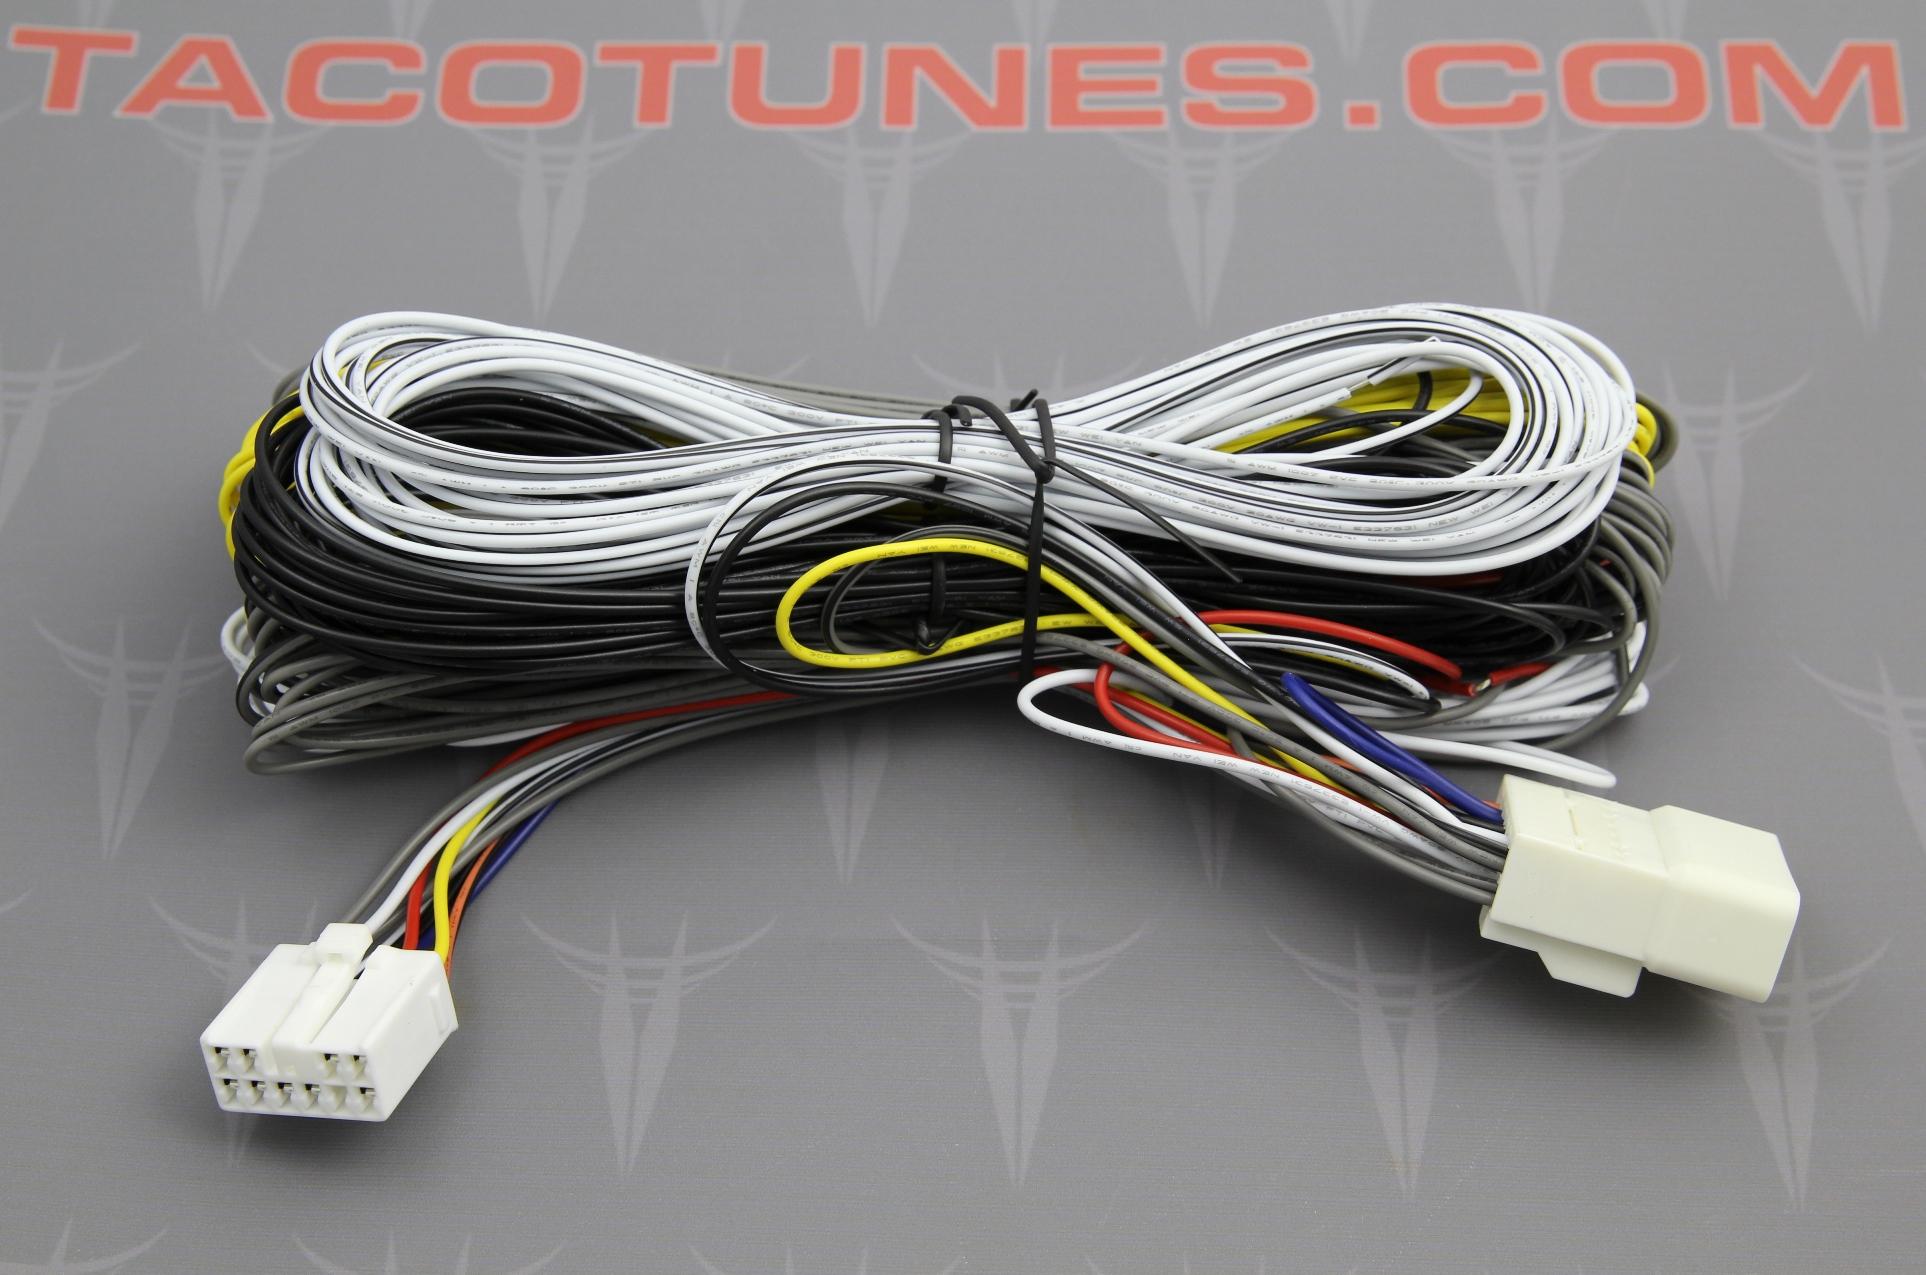 toyota camry sound processor wire harness integration system. Black Bedroom Furniture Sets. Home Design Ideas